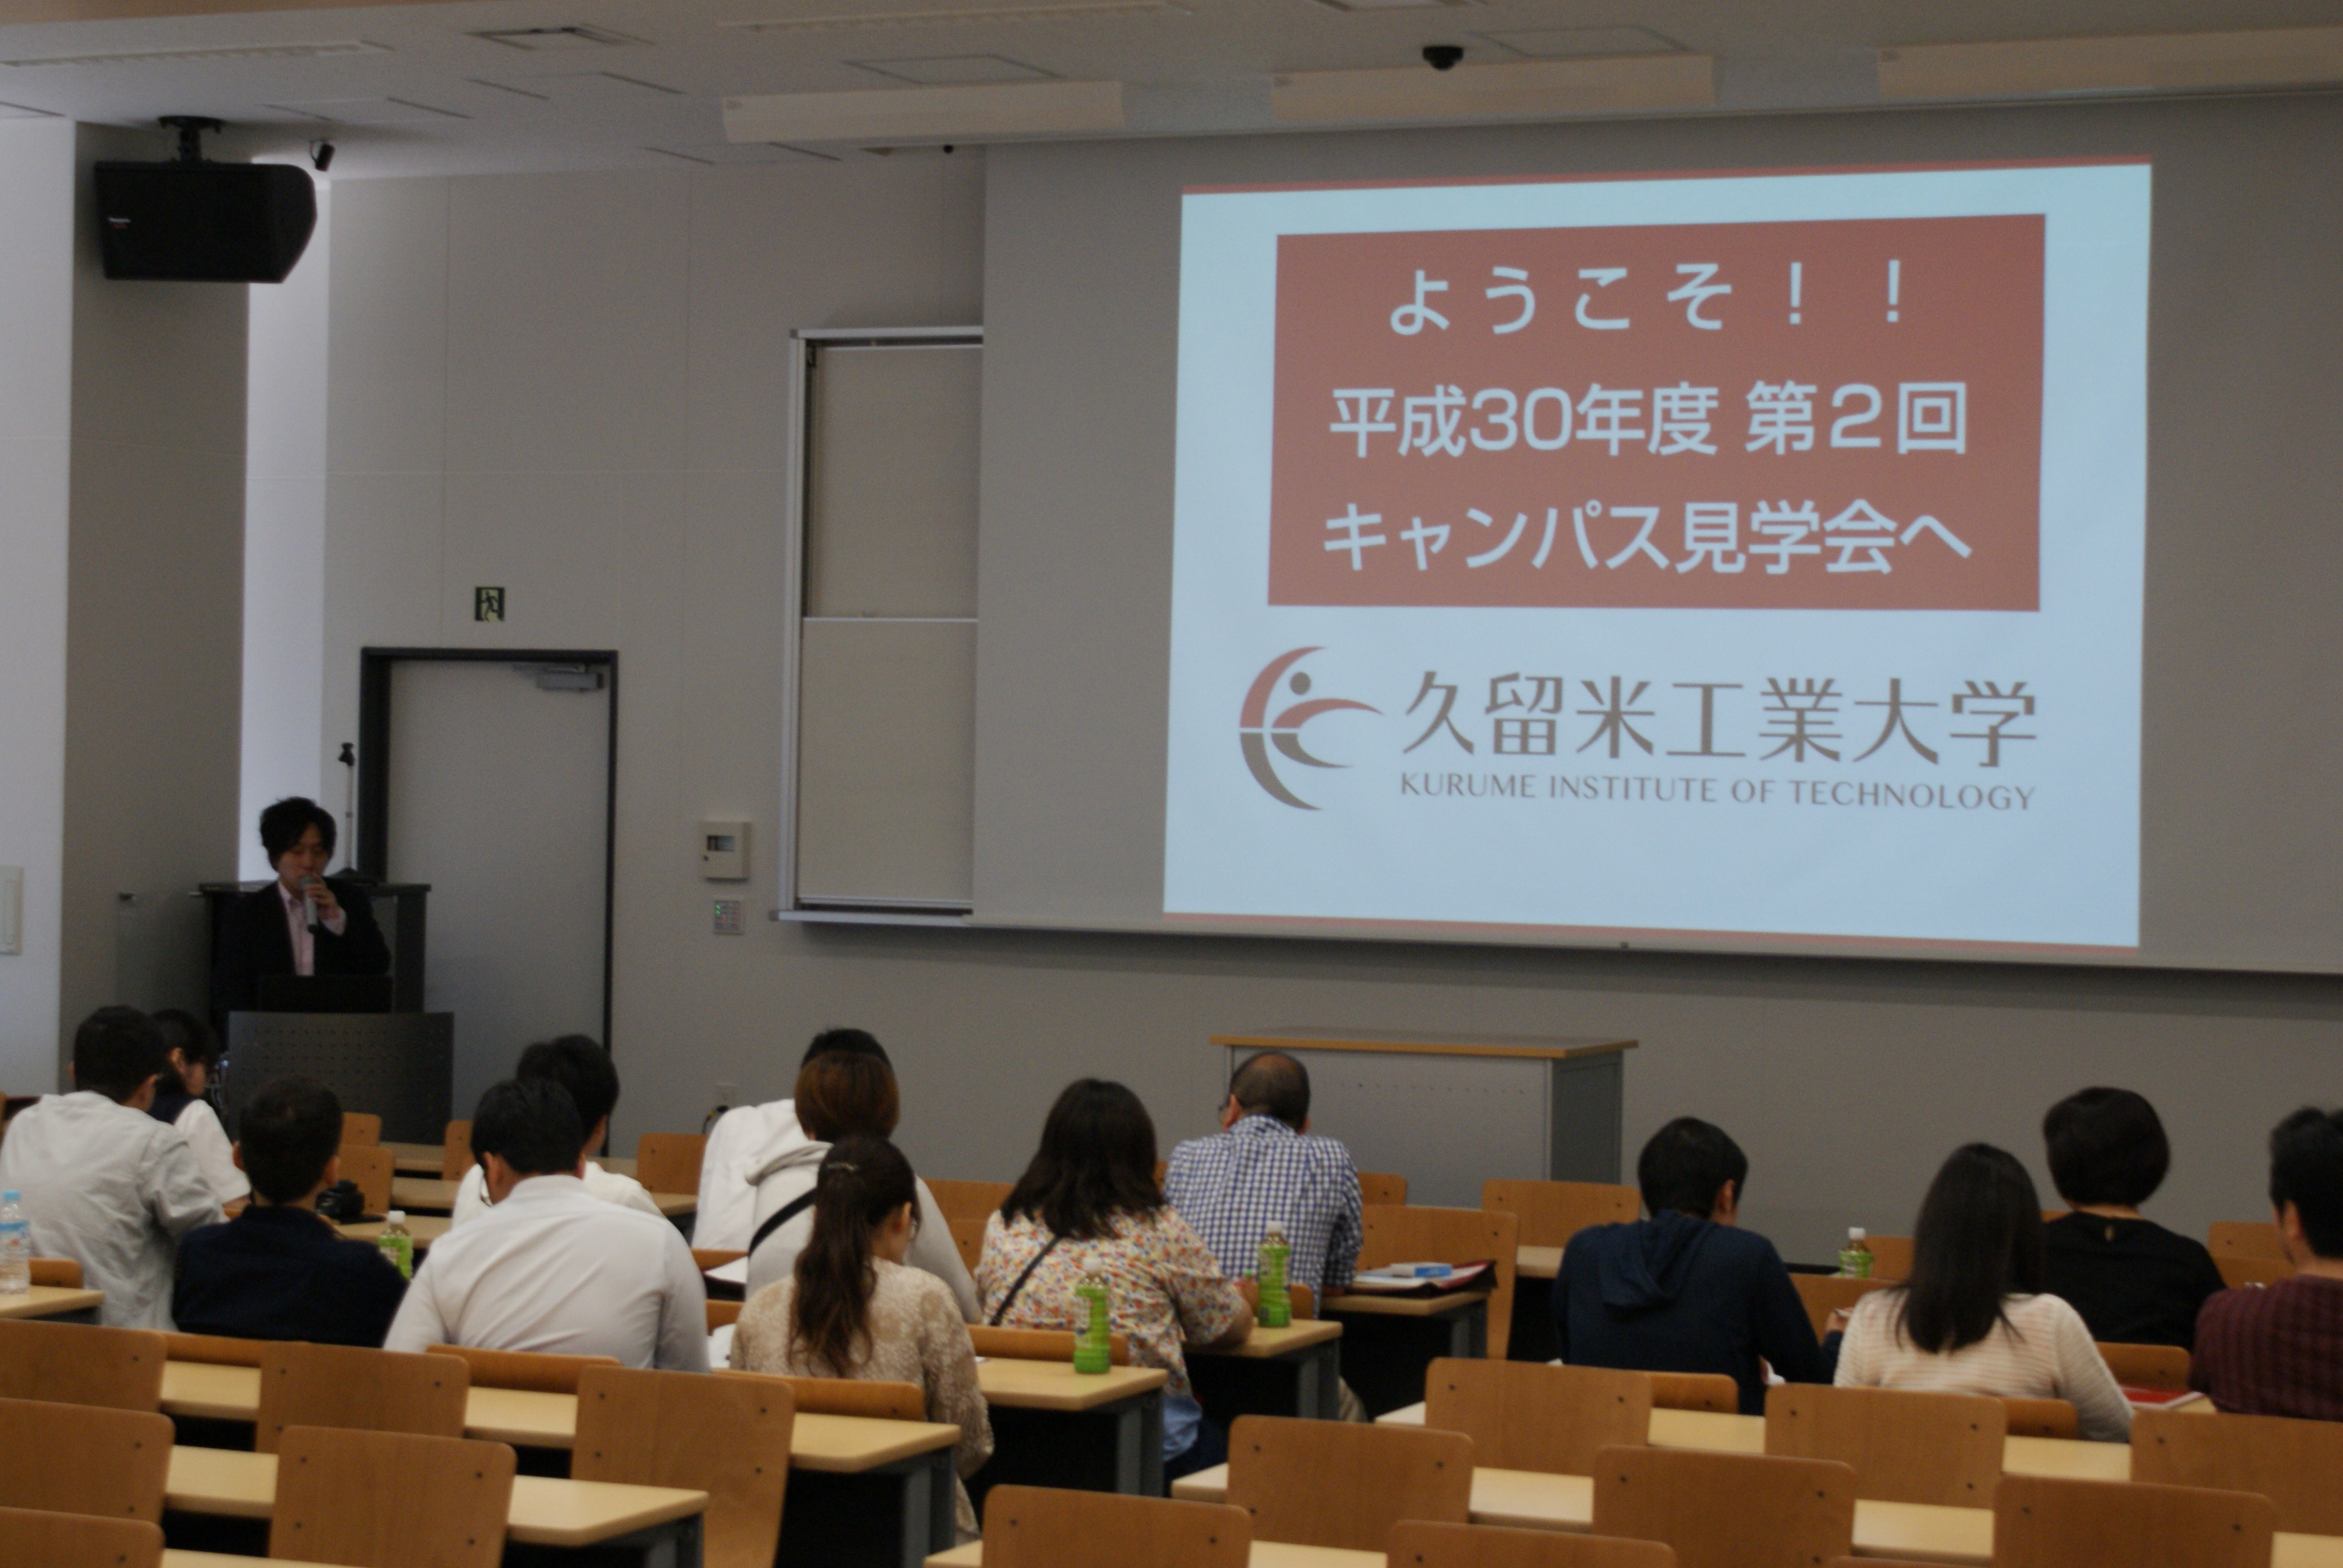 http://www.kurume-it.ac.jp/news/DSC05614%20-%20%E3%82%B3%E3%83%94%E3%83%BC.JPG